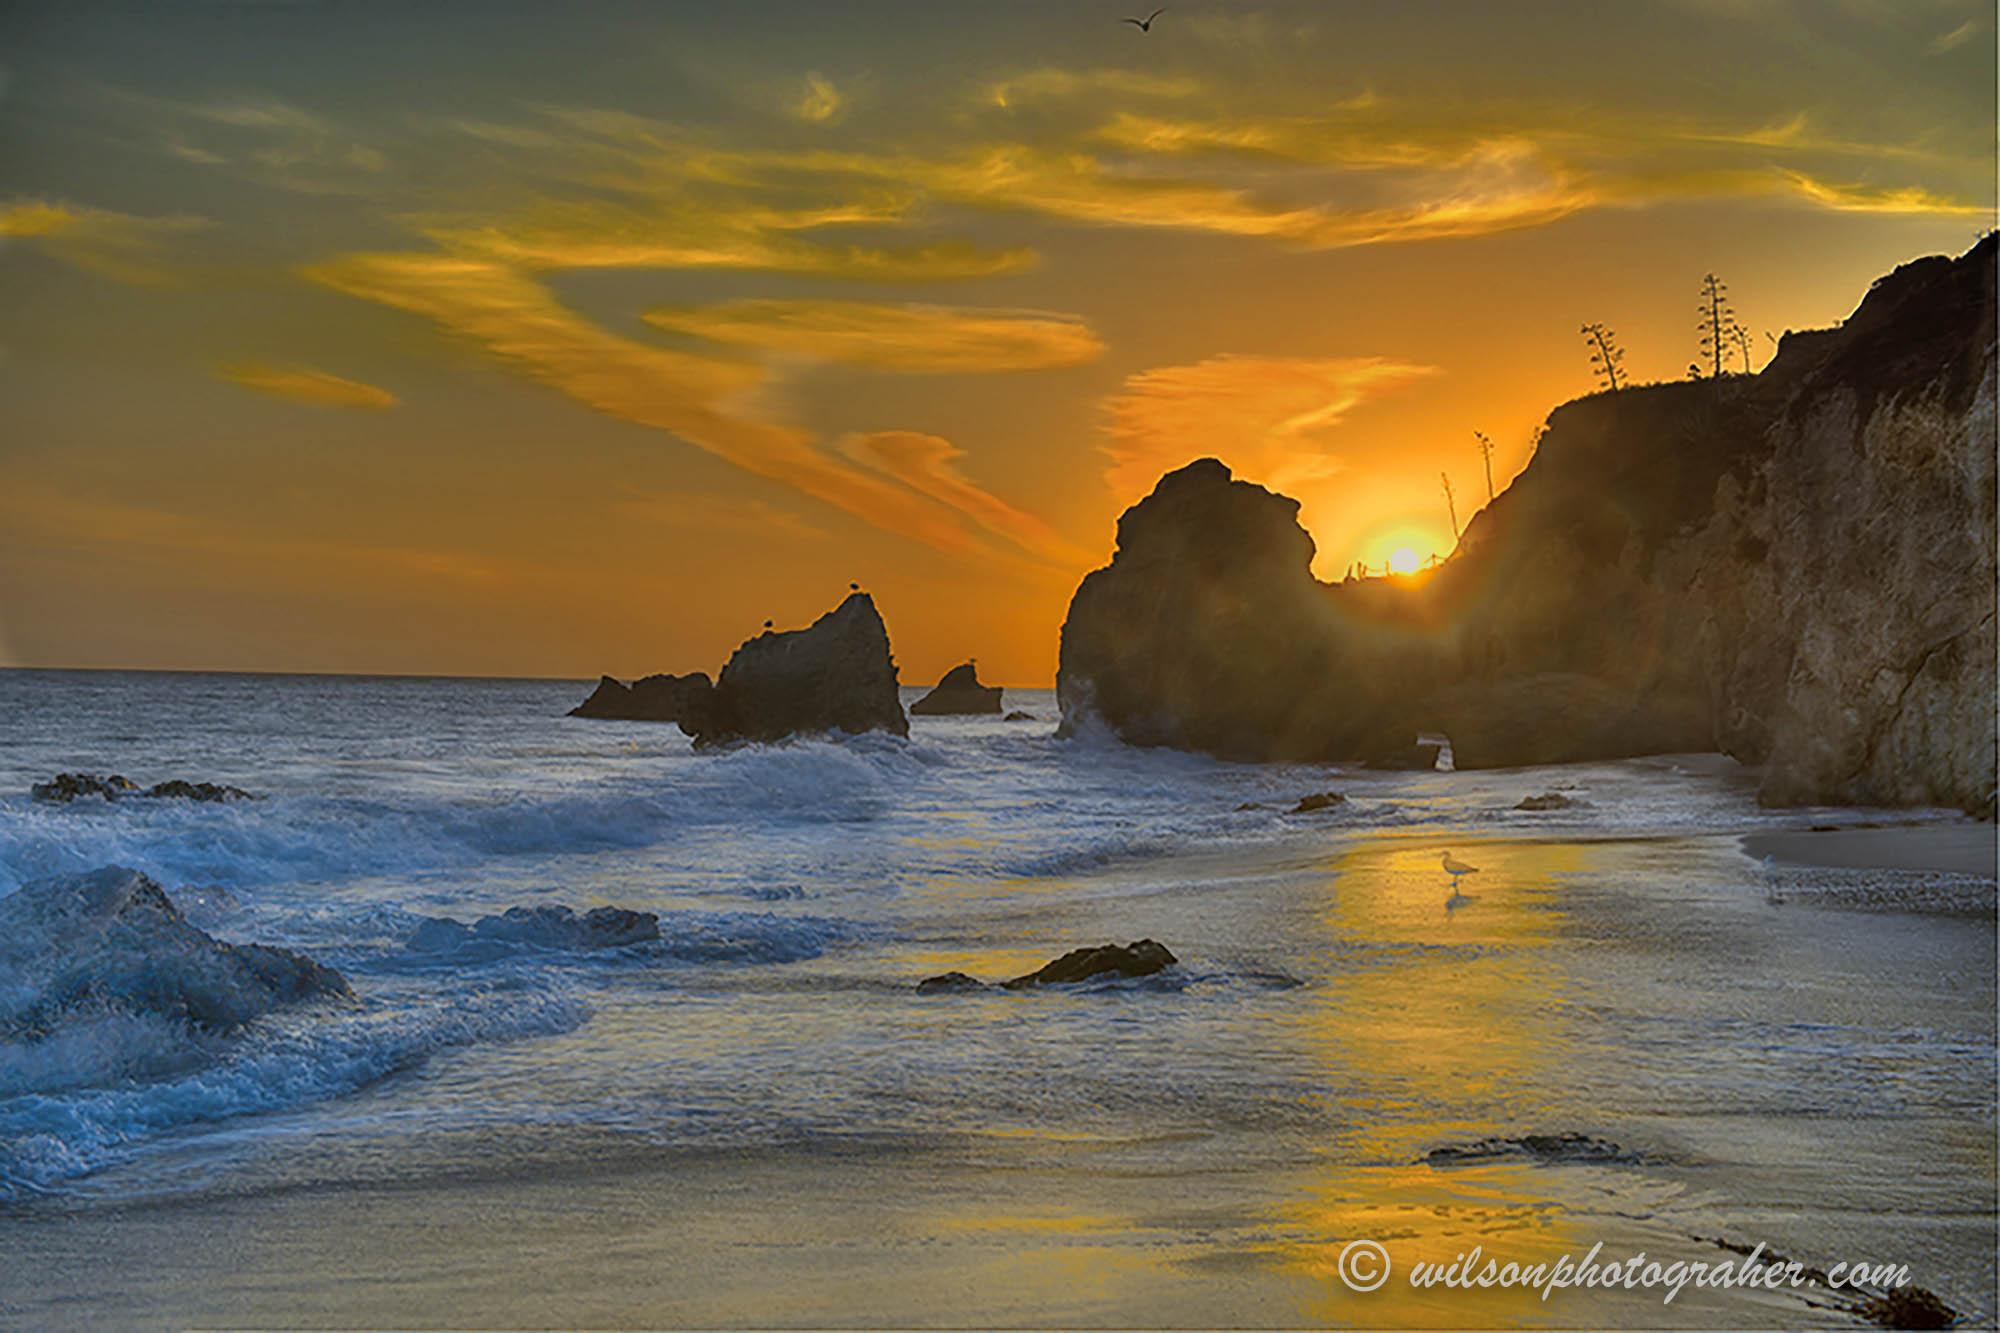 Golden Hour - Malibu Beach, Ca